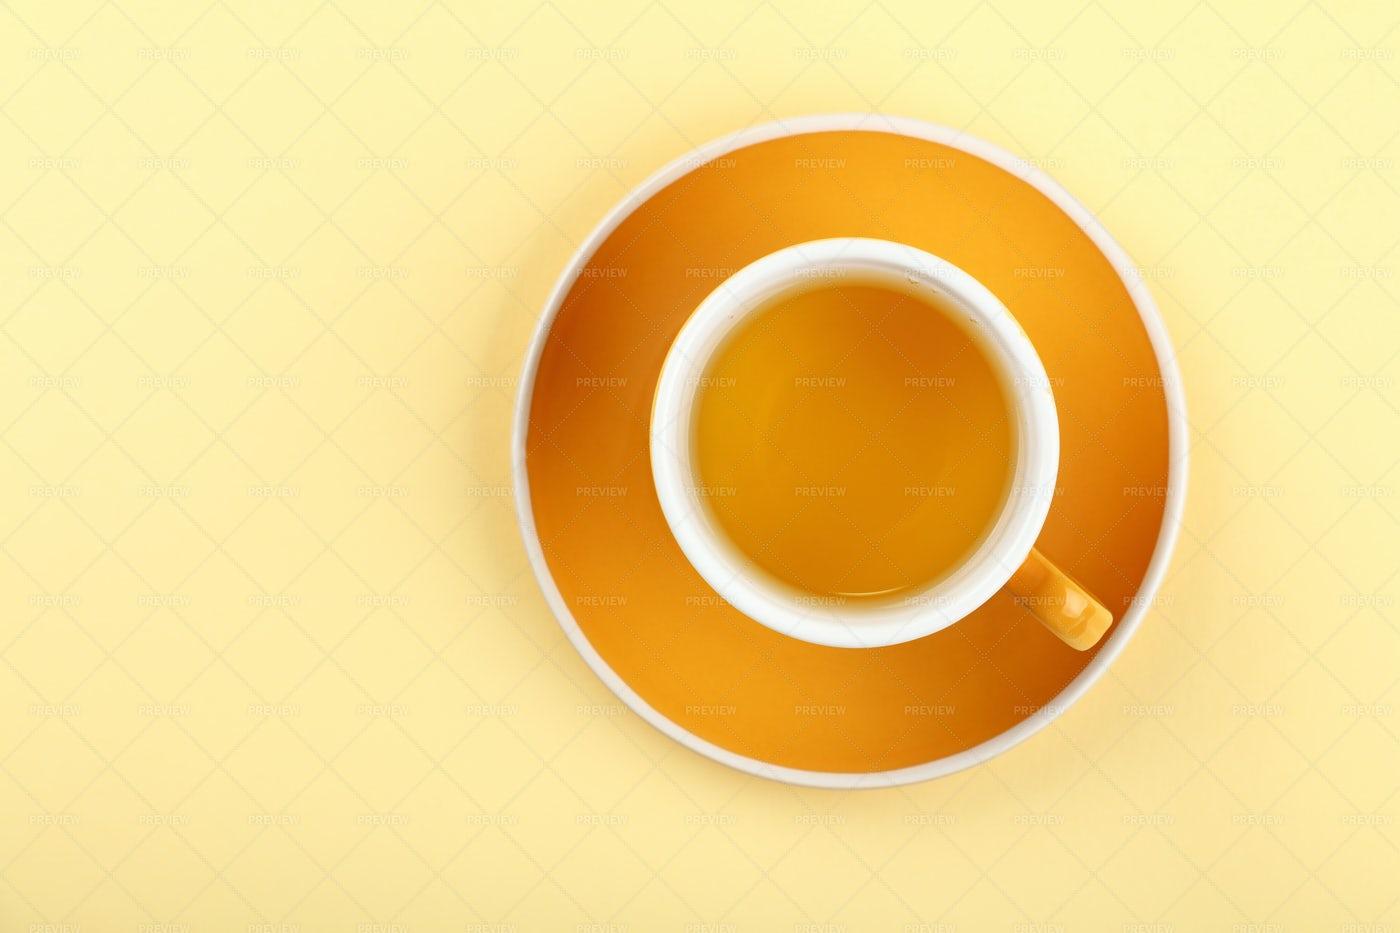 Green Tea In Orange Cup: Stock Photos